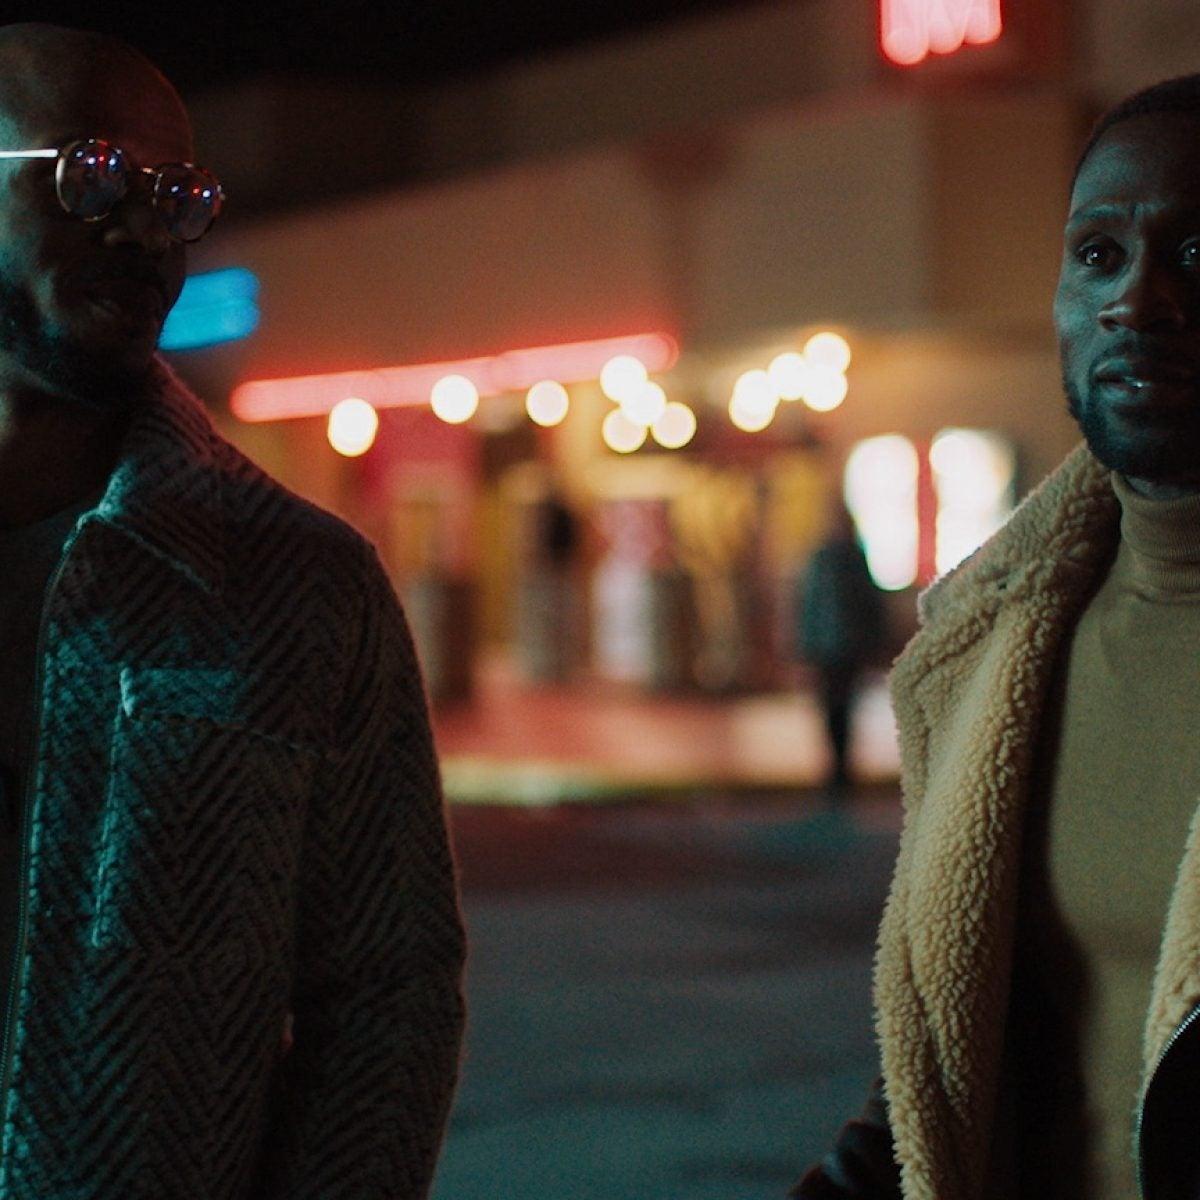 Deji LaRay & Thomas Q. Jones On Showing Black Men In Ways We've Never Seen With New TV Show 'Johnson'